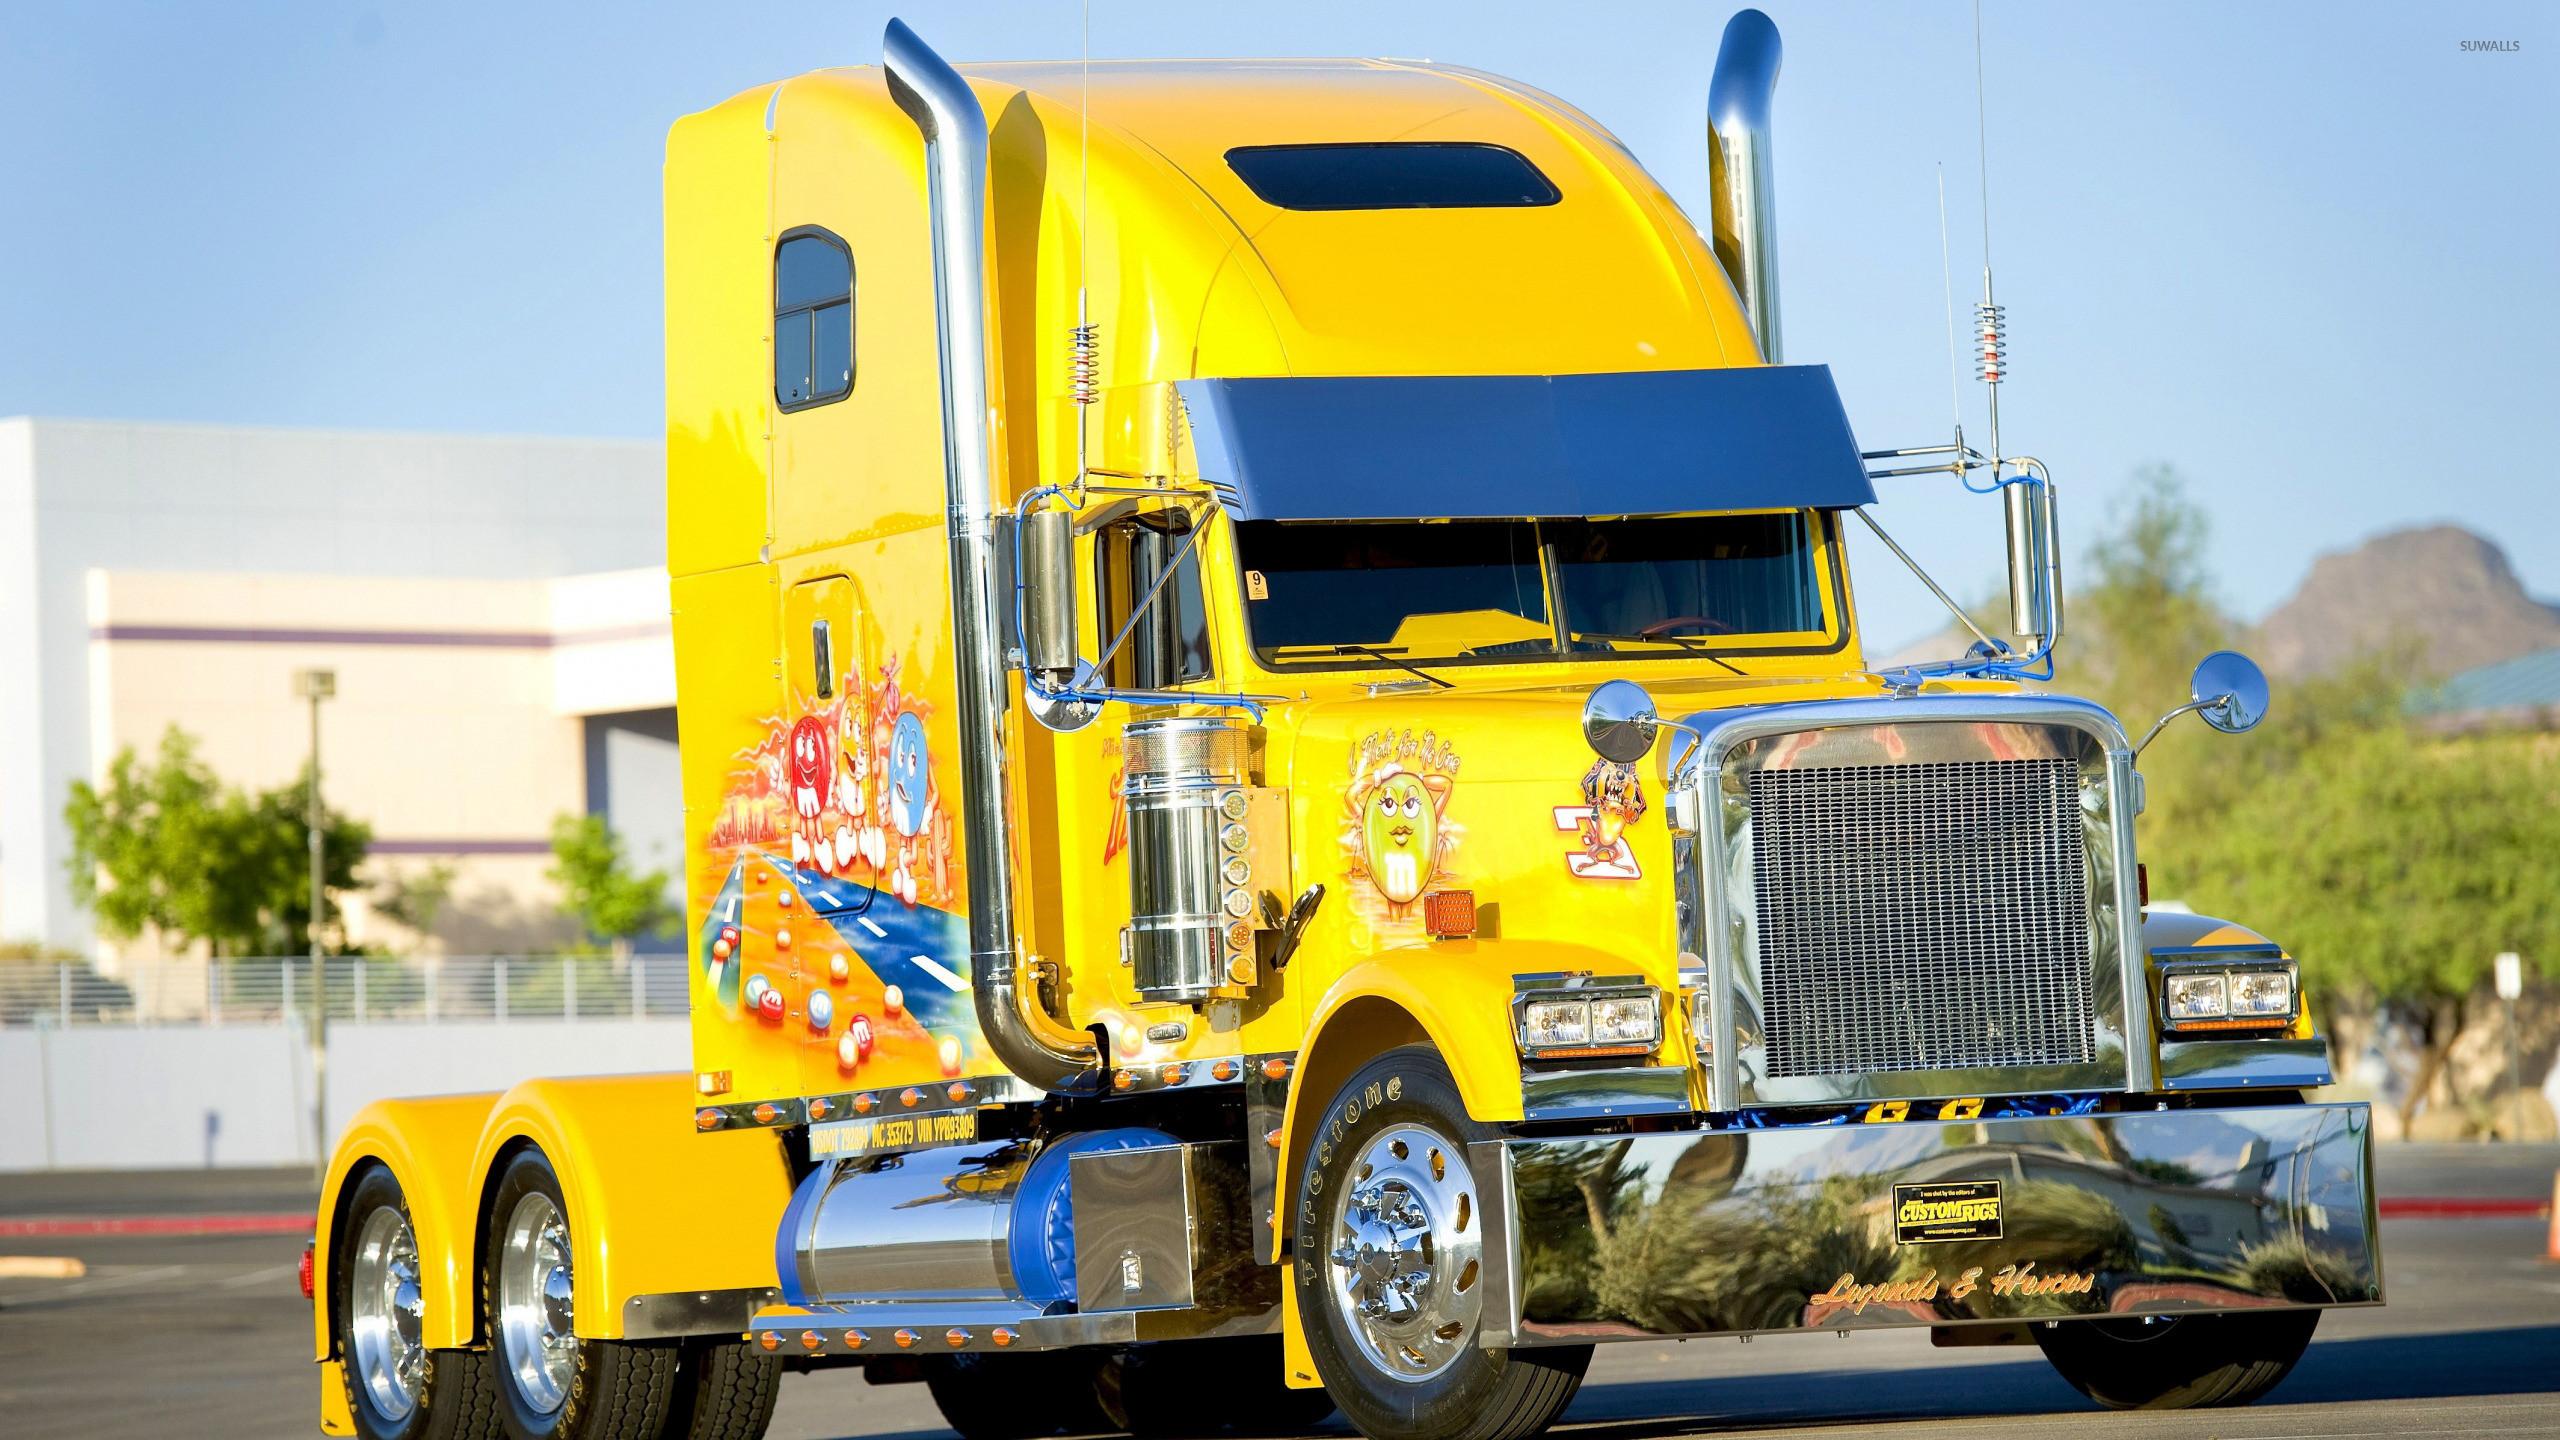 Freightliner Truck wallpaper jpg